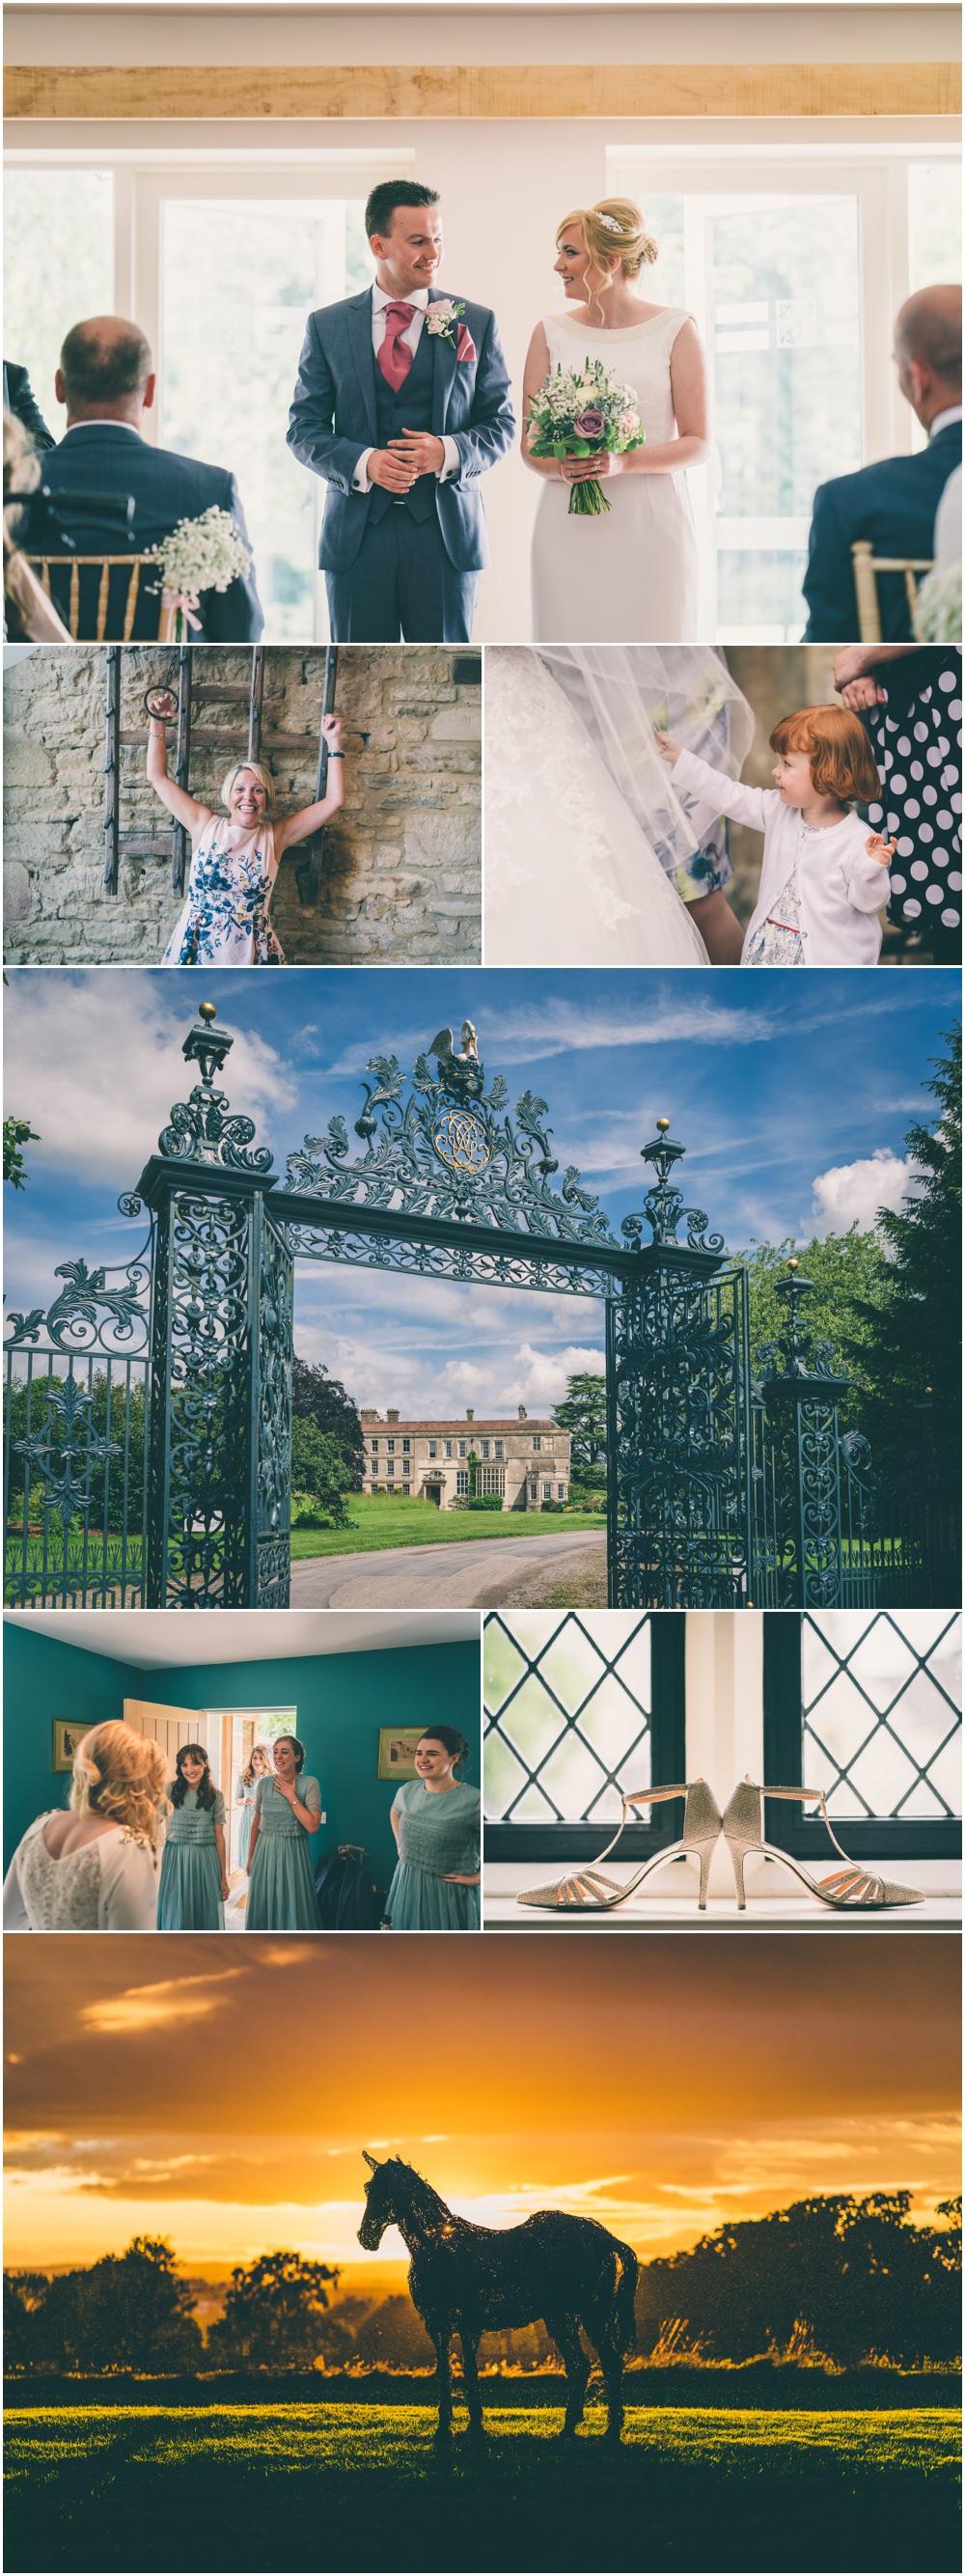 2017 Summer Wedding Photography